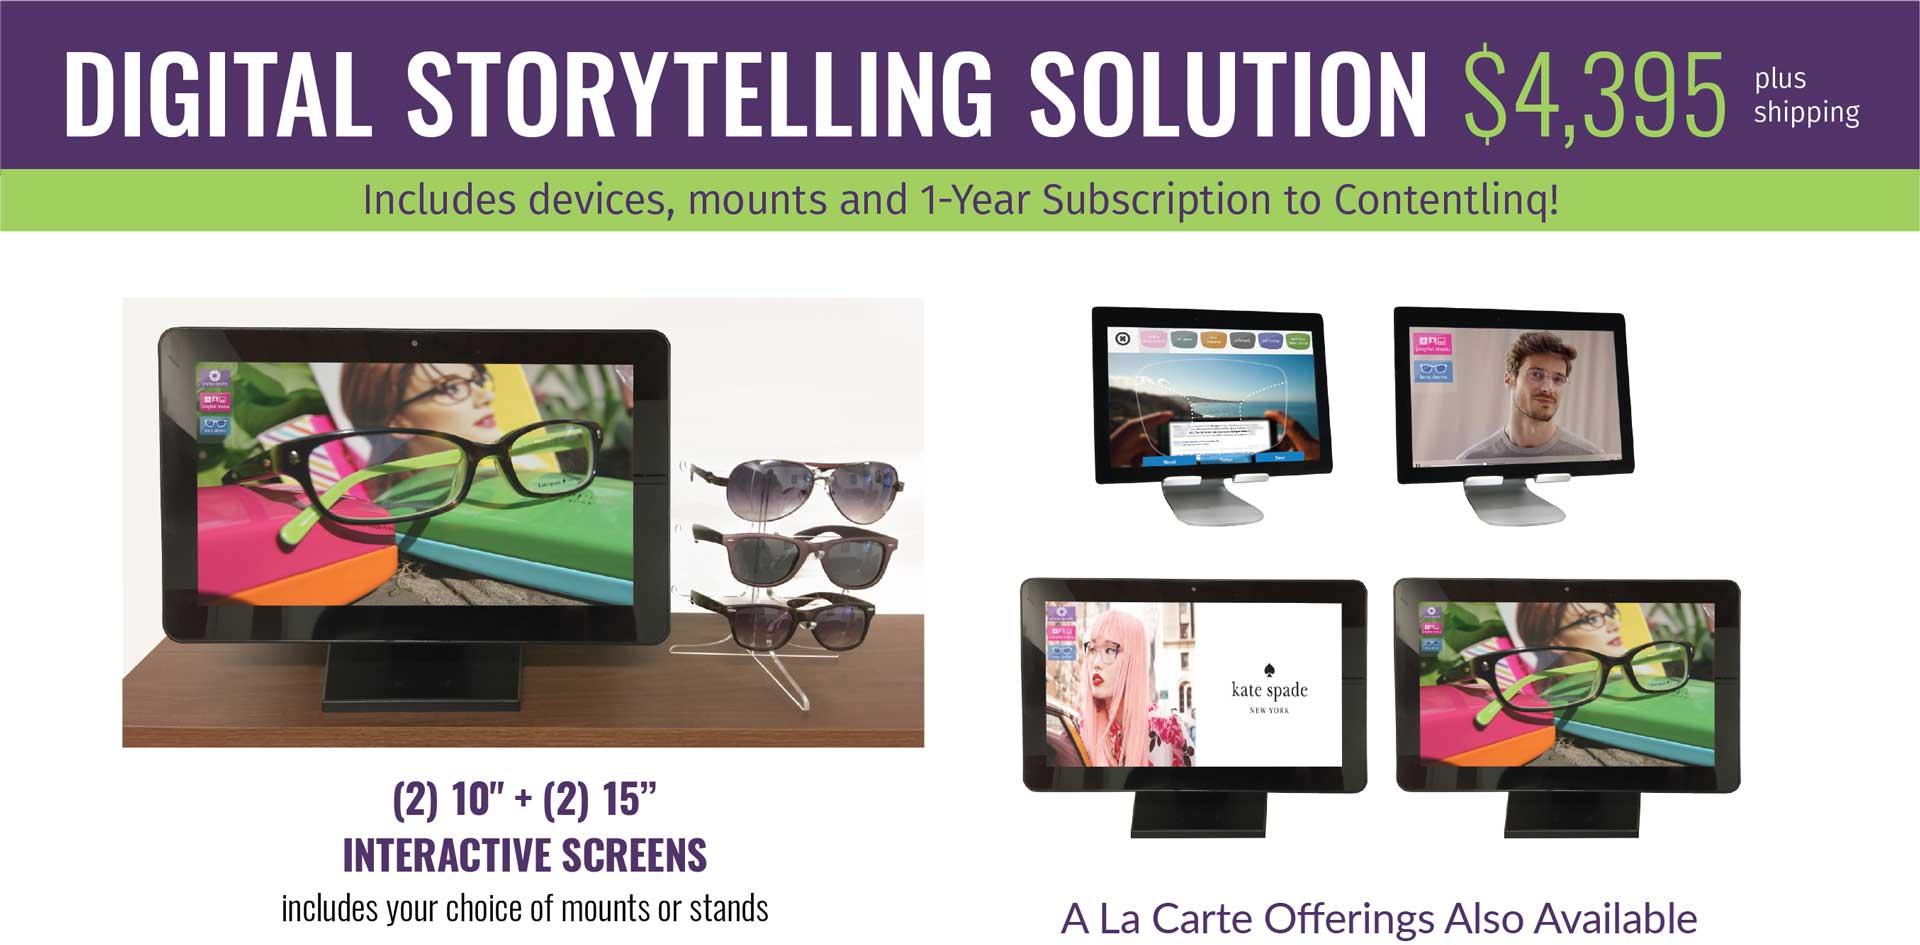 Digital Storytelling Solution